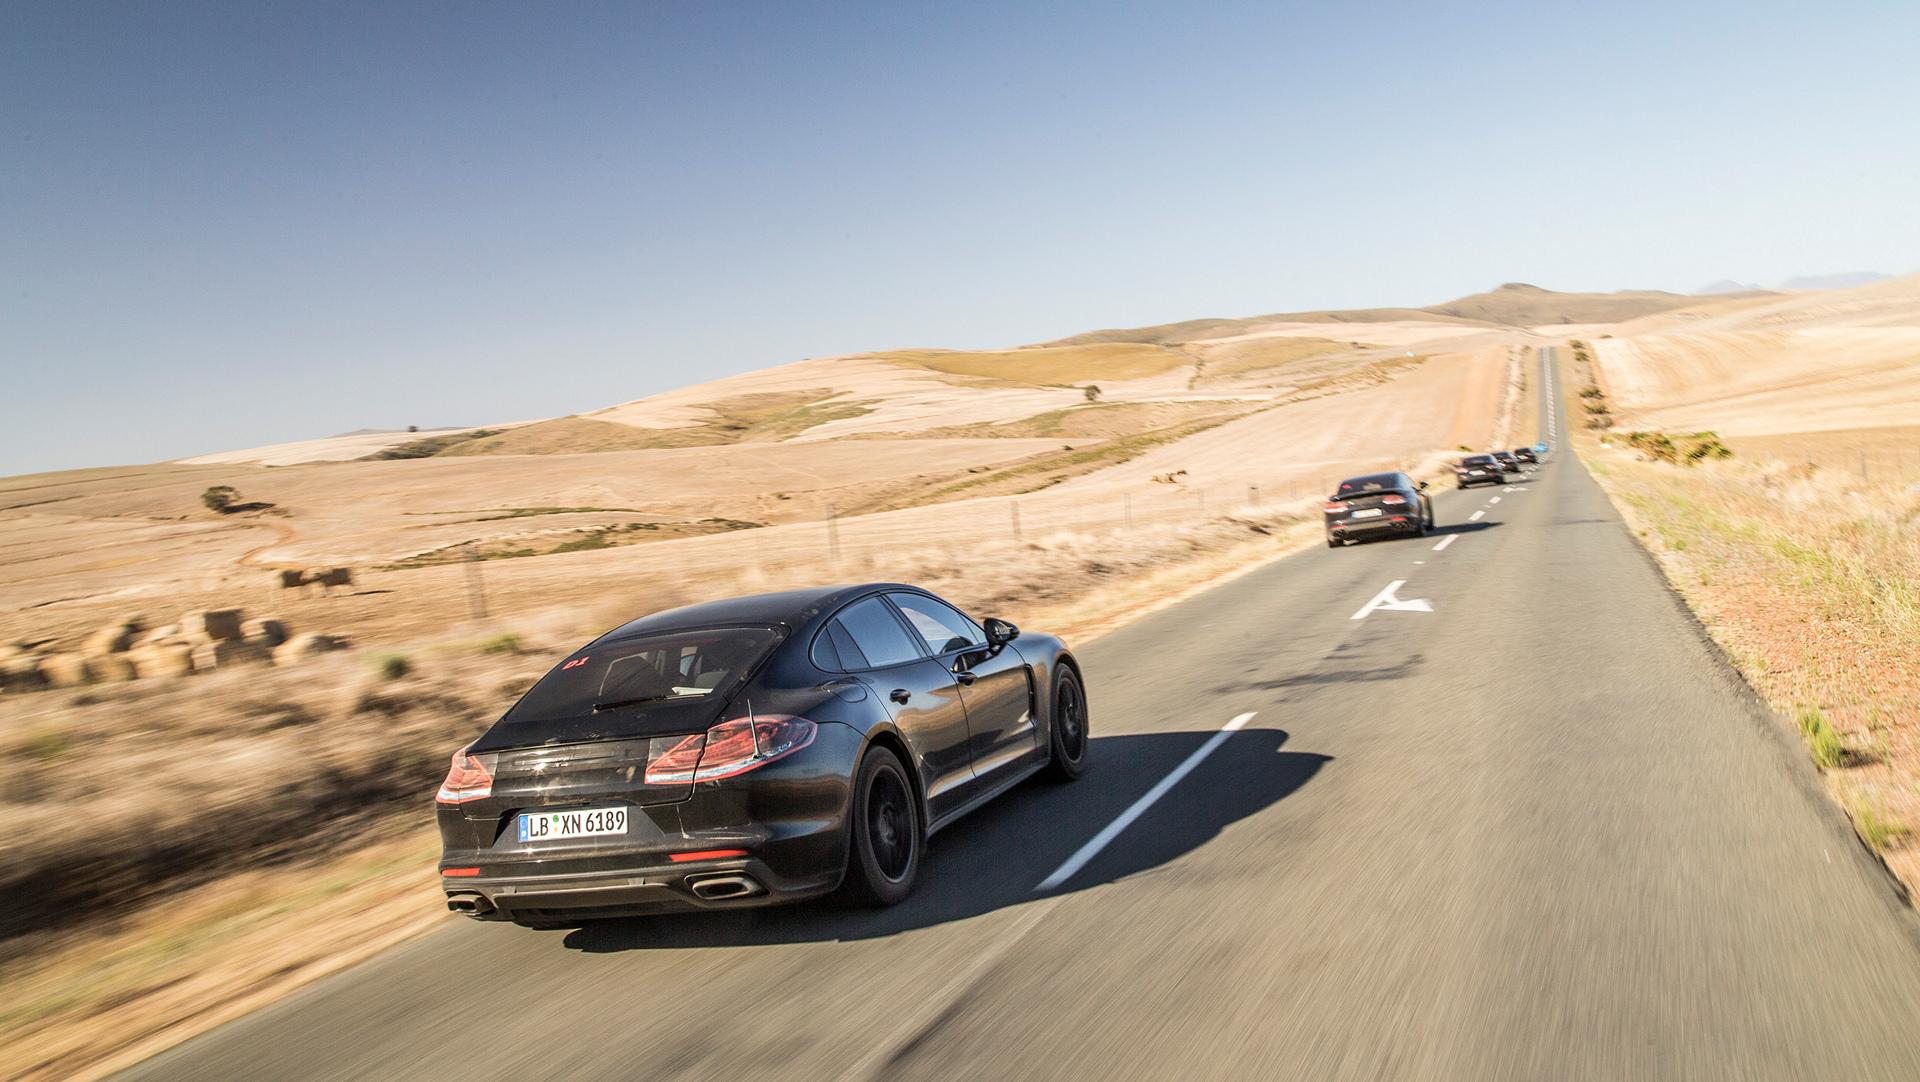 Porsche Panamera © Dr. Ing. h.c. F. Porsche AG